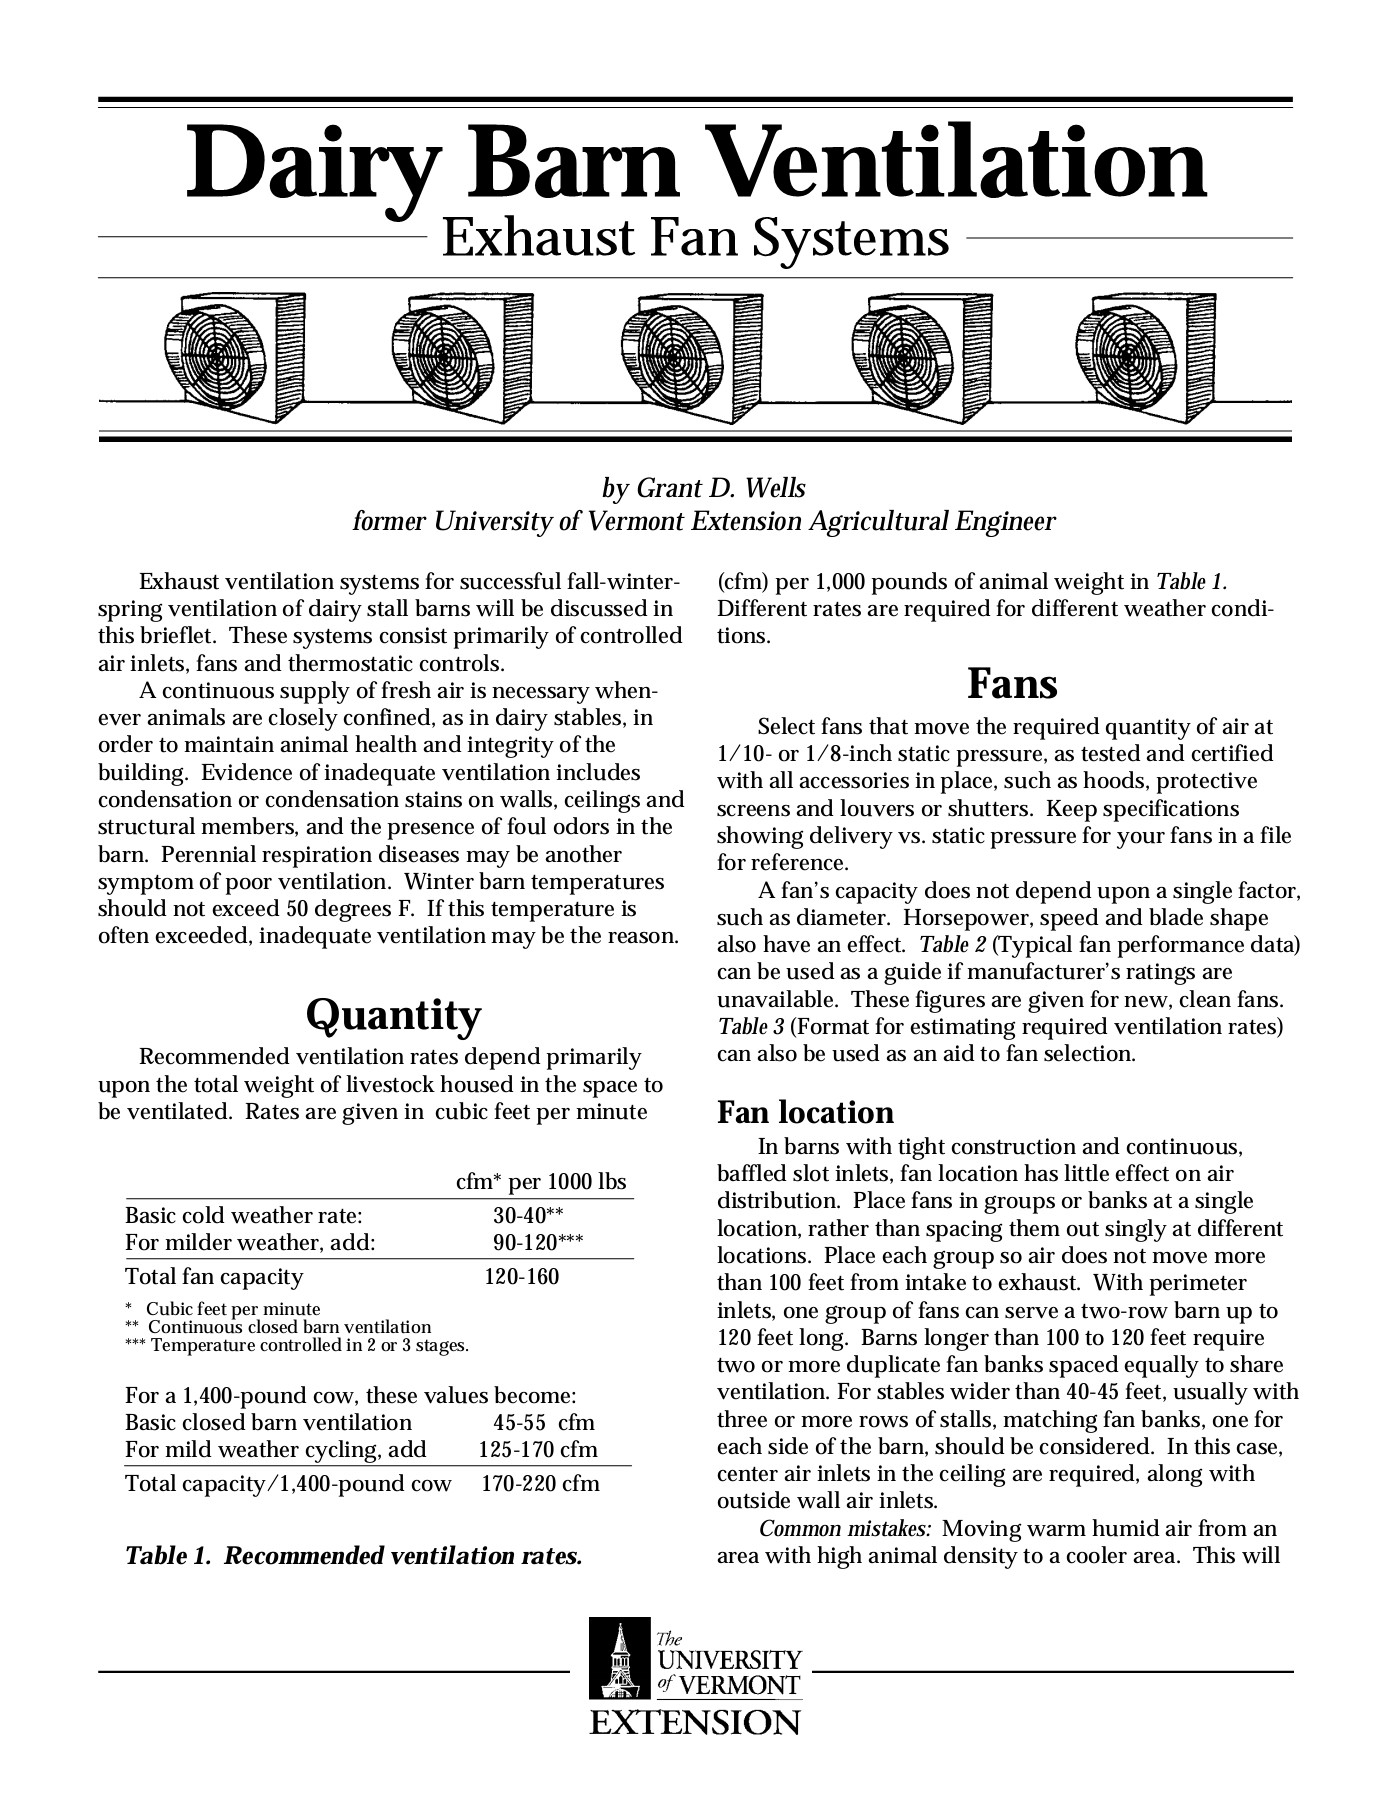 Exhaust Fan Cfm Per Square Foot • Cabinet Ideas